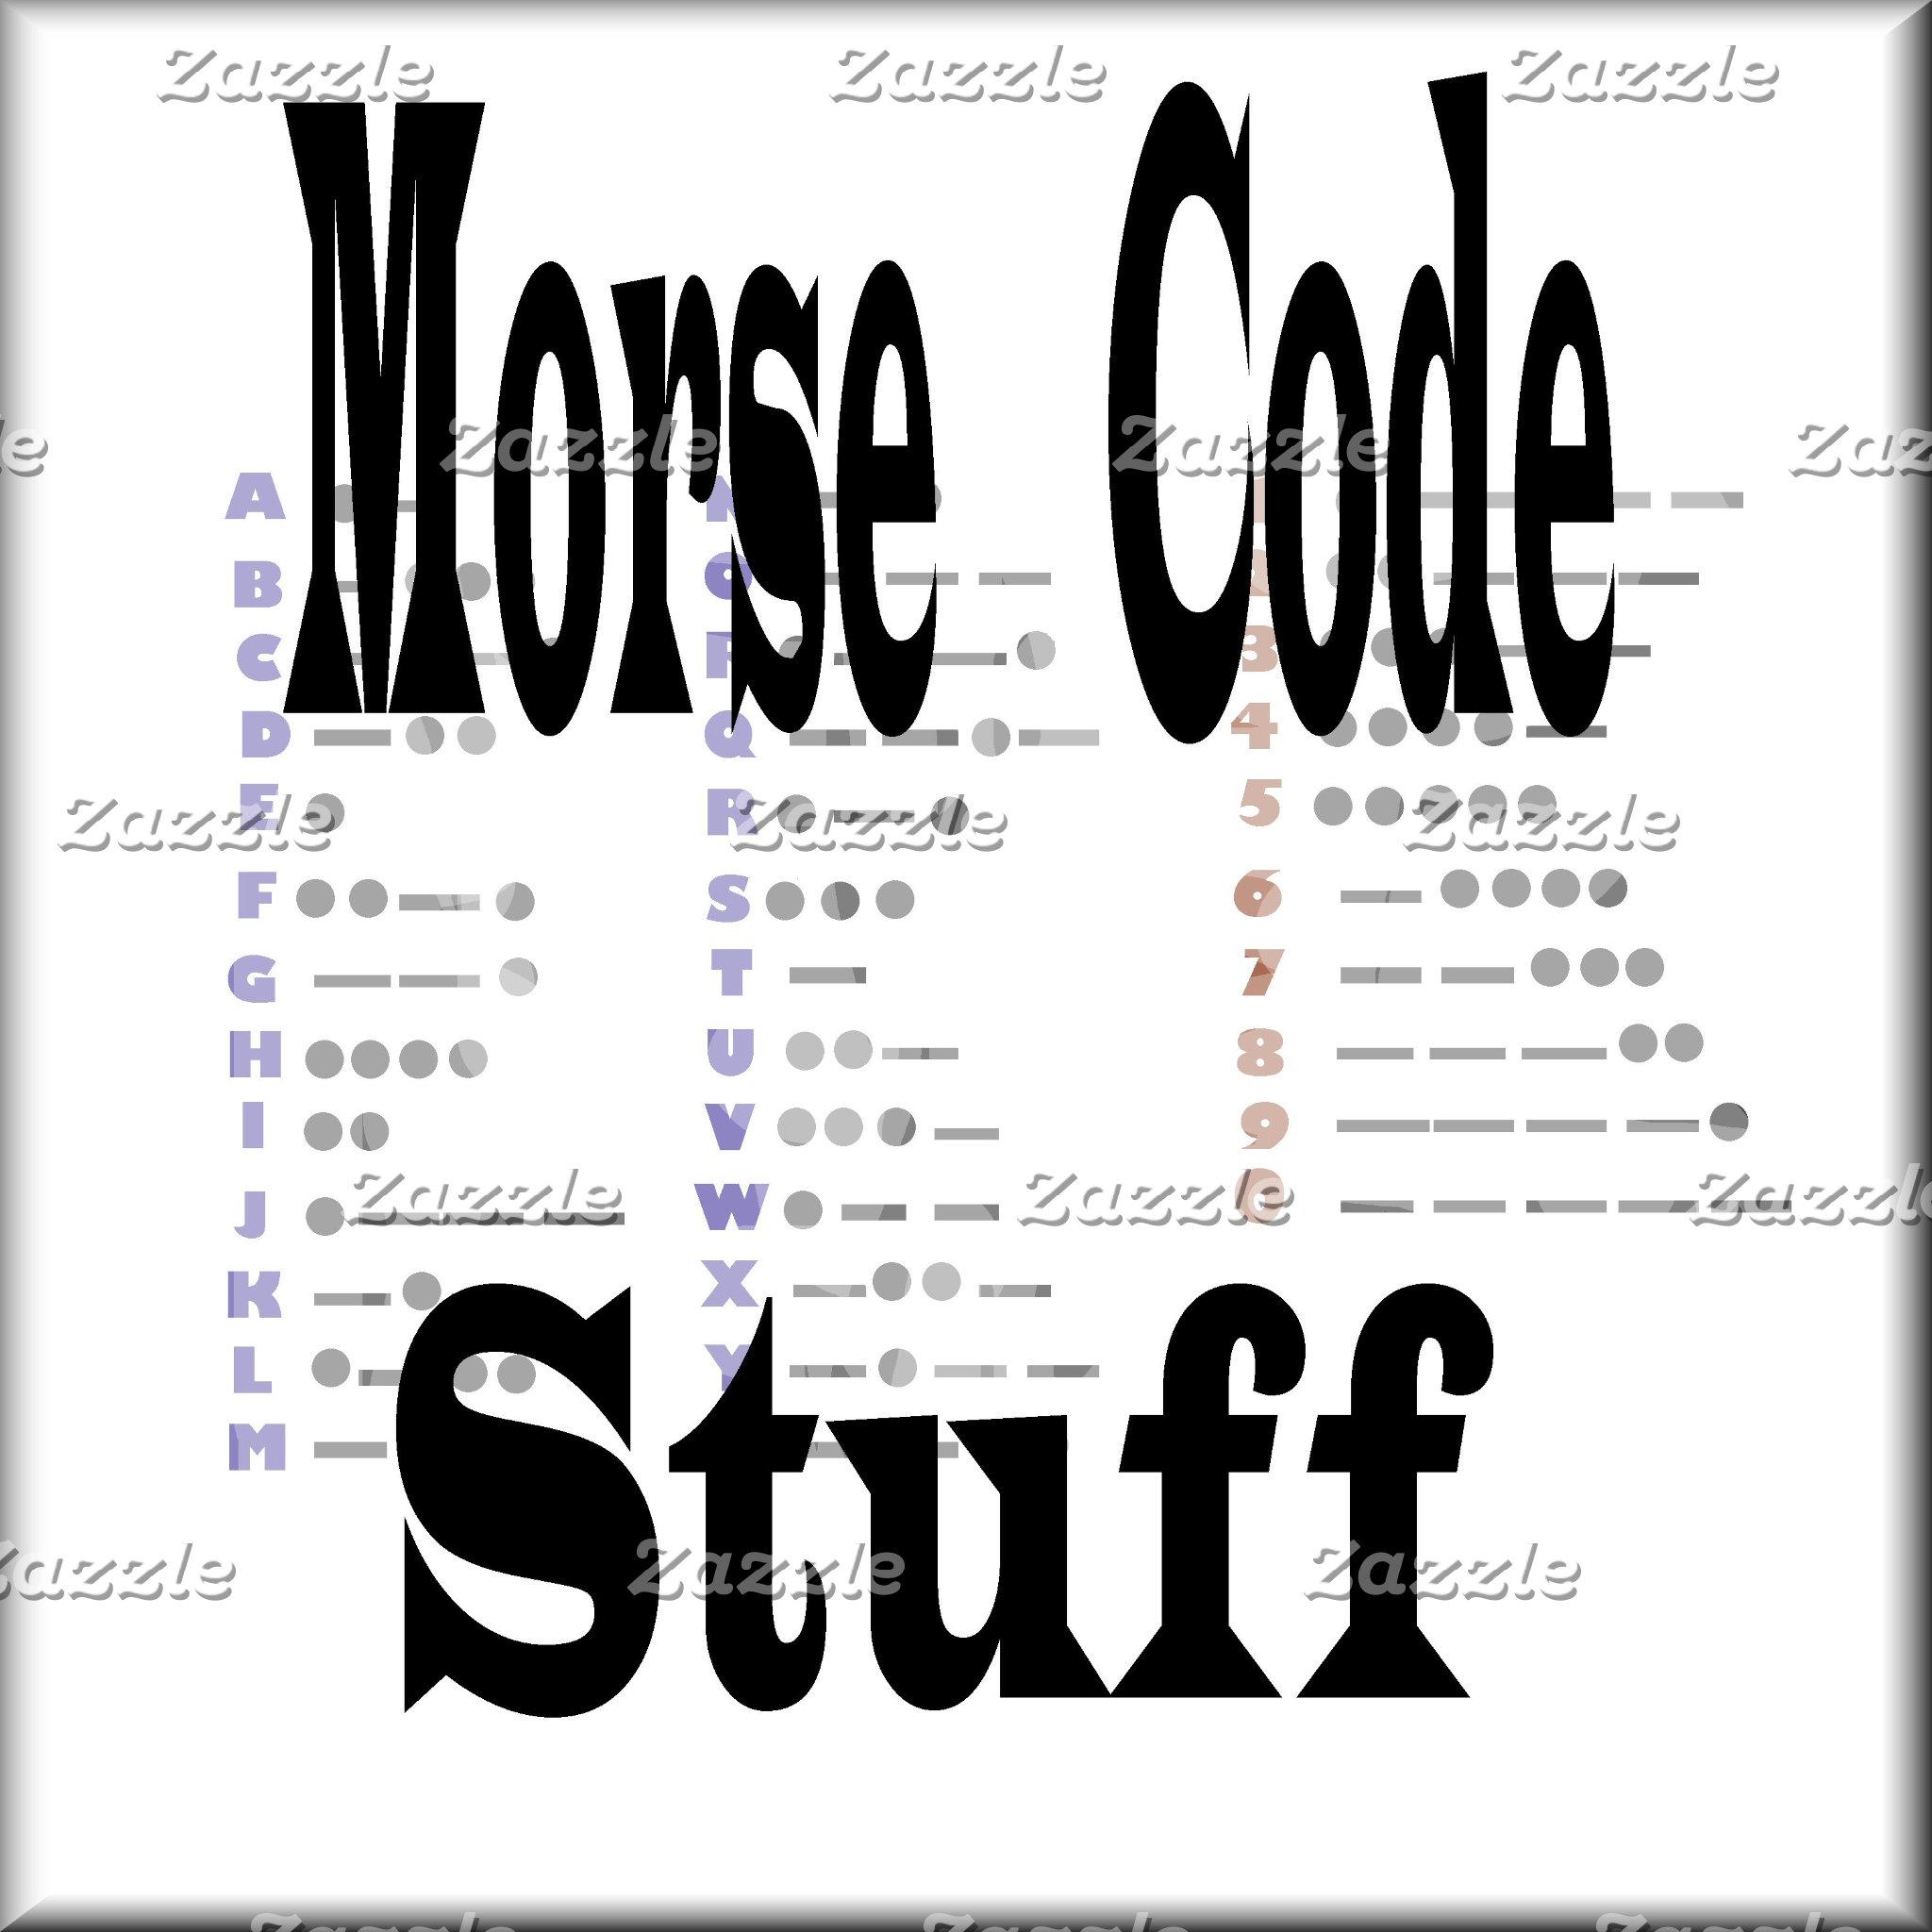 MORSE CODE or CW